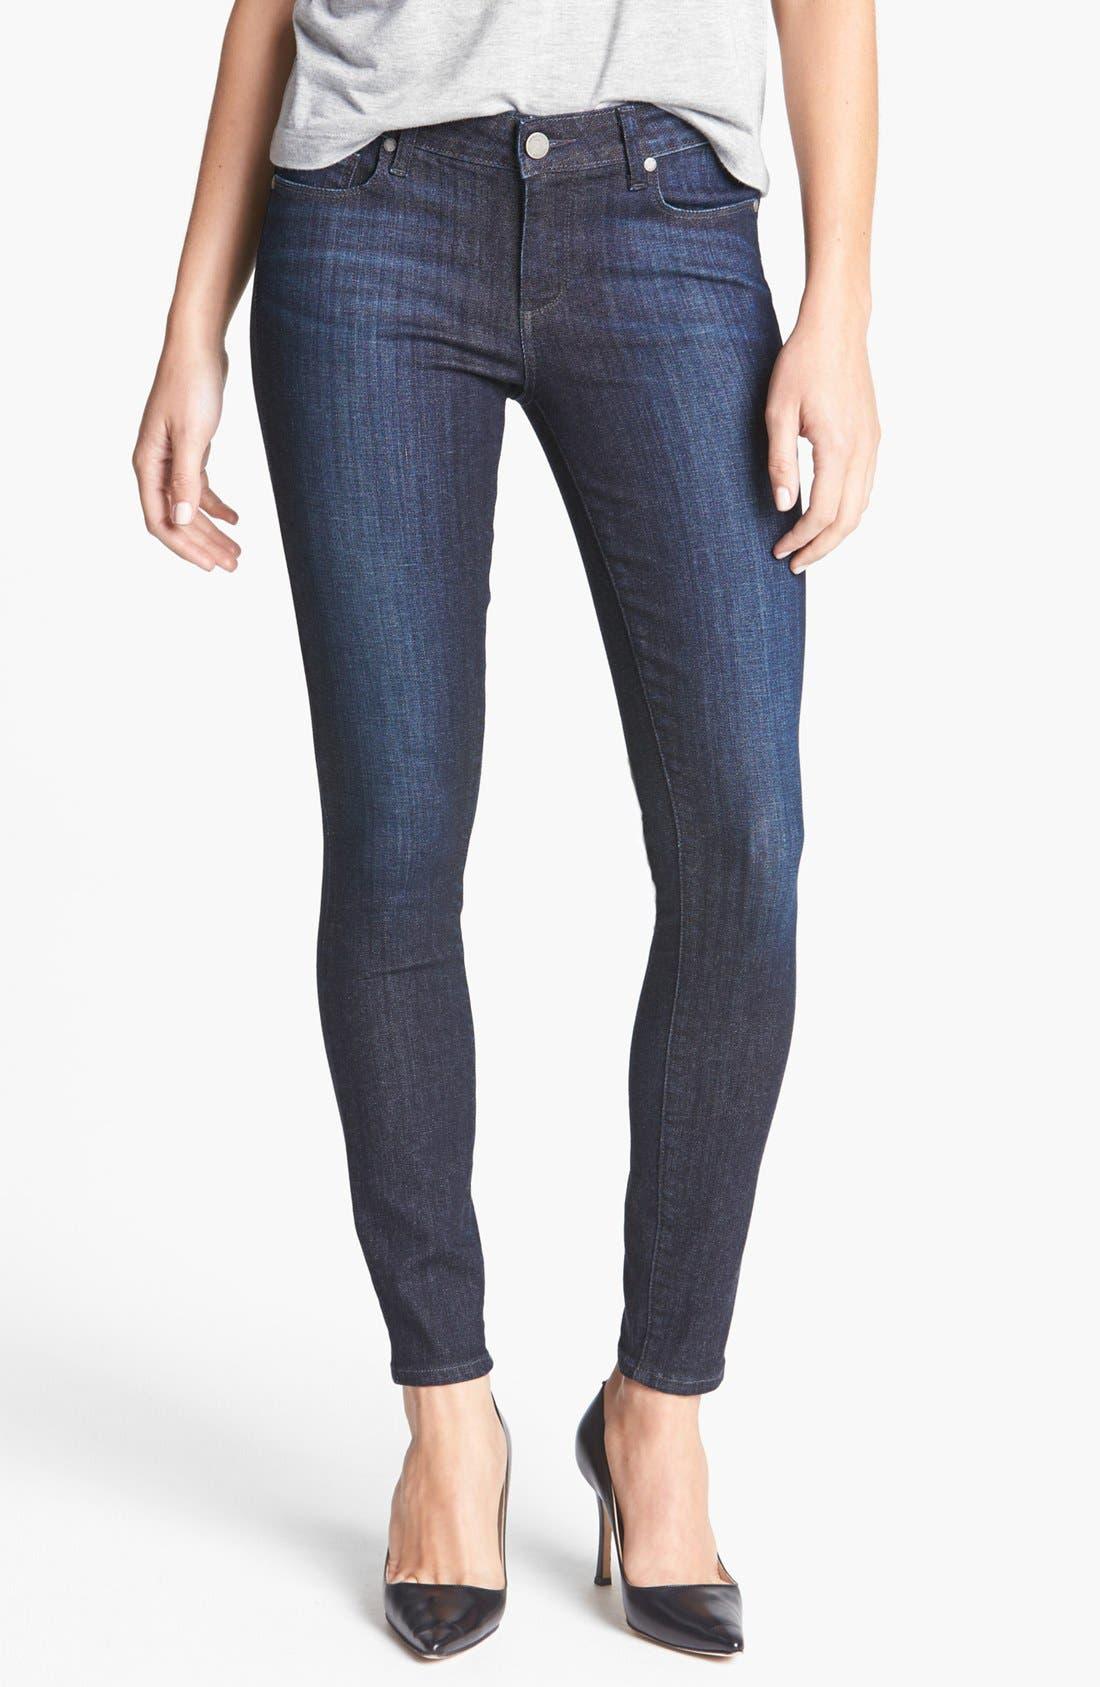 Alternate Image 1 Selected - Paige Denim 'Verdugo' Ultra Skinny Jeans (Rainier)